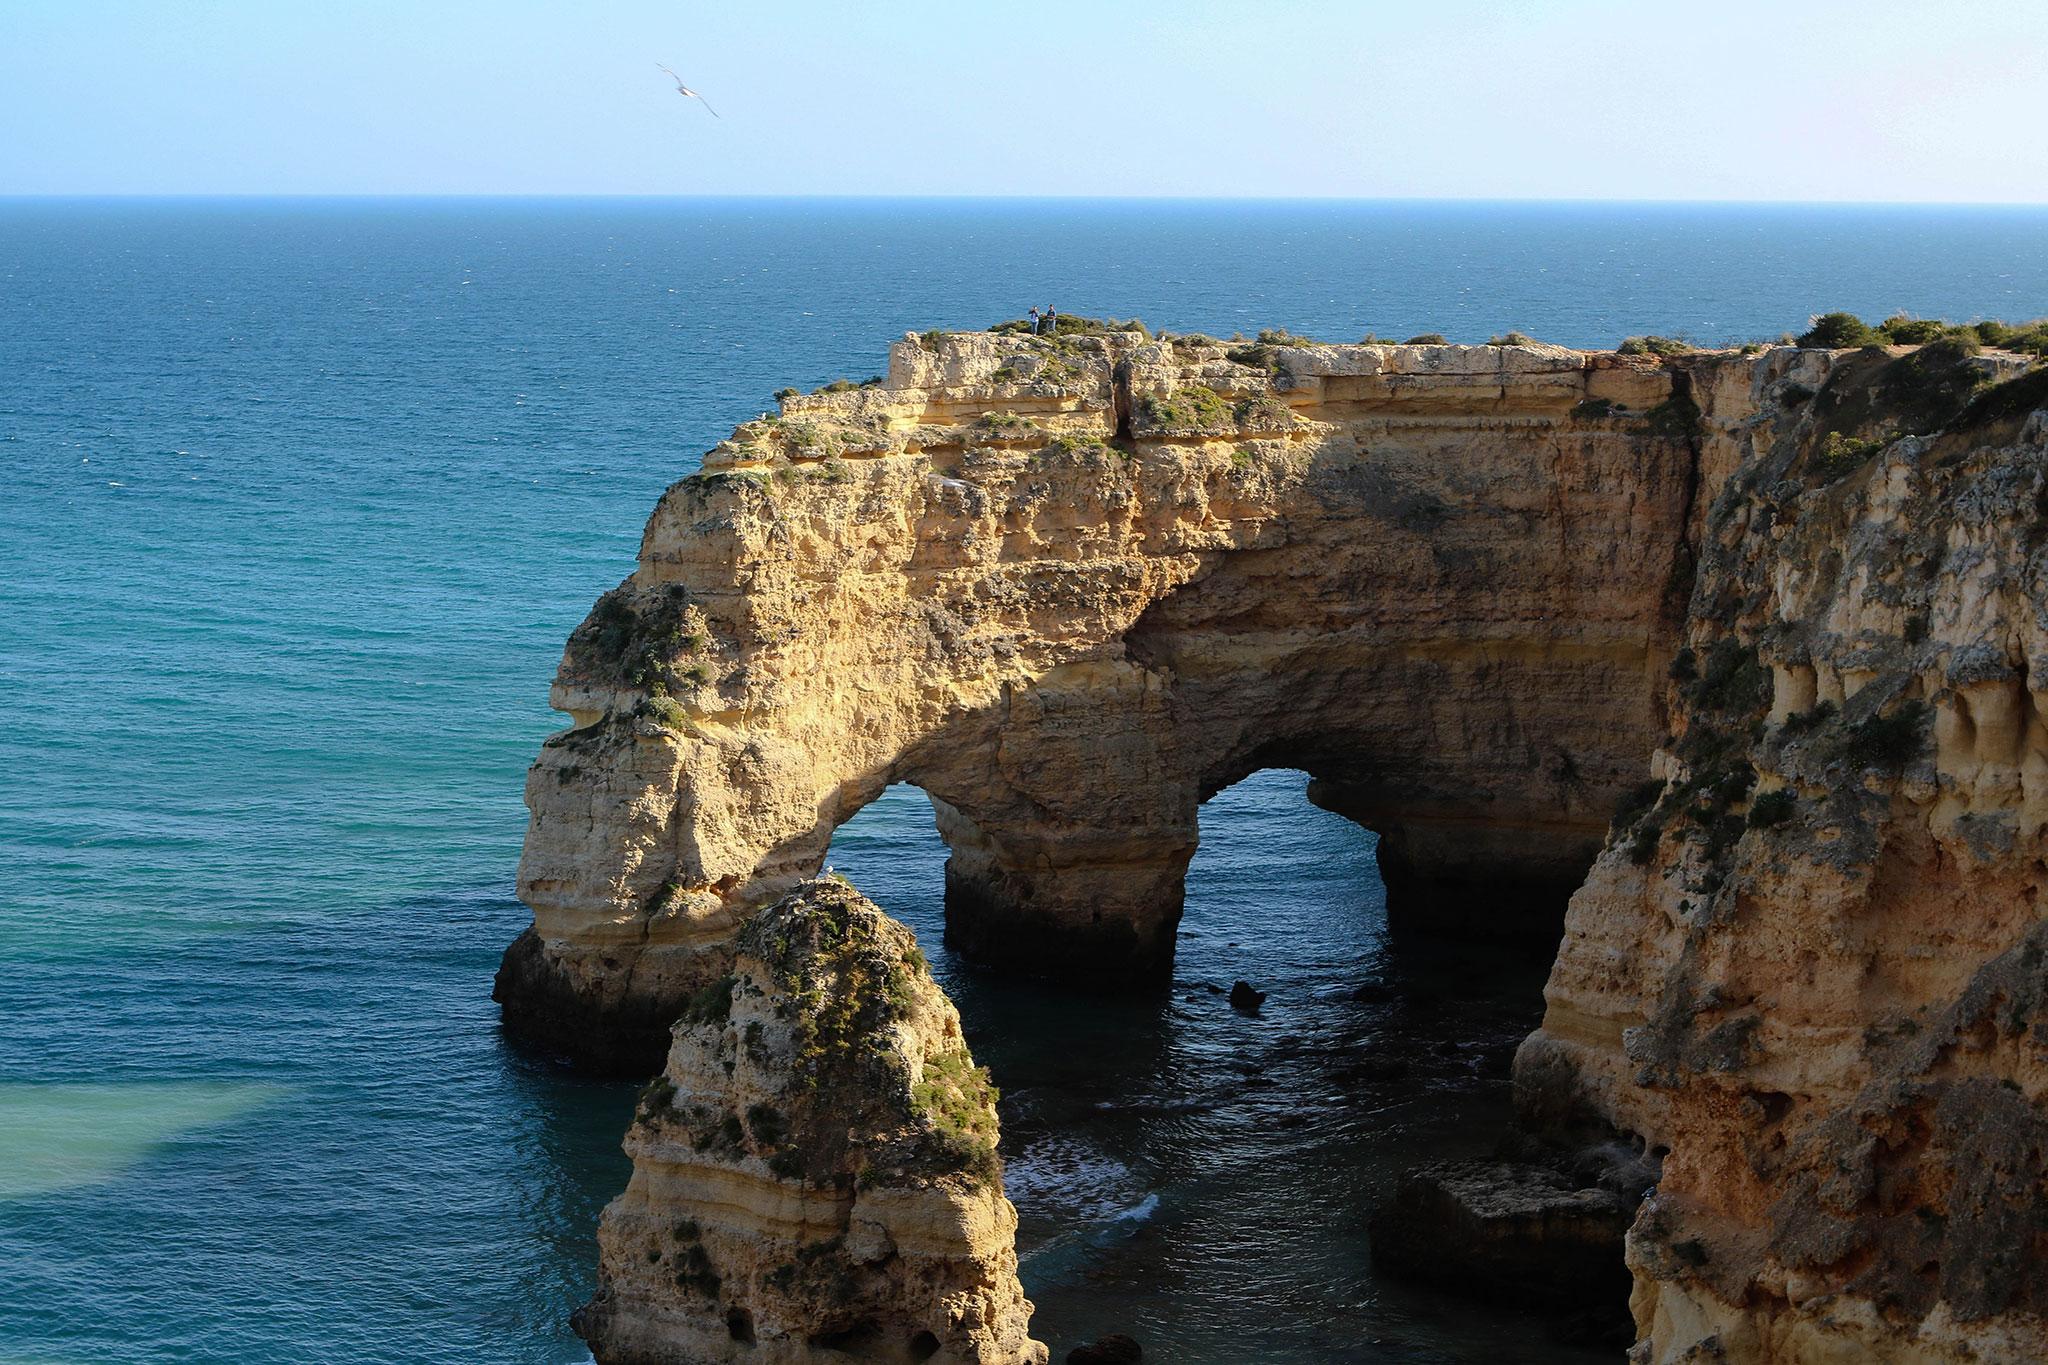 Praia_da_marinha_algarve_tour_trips_beleza_natural